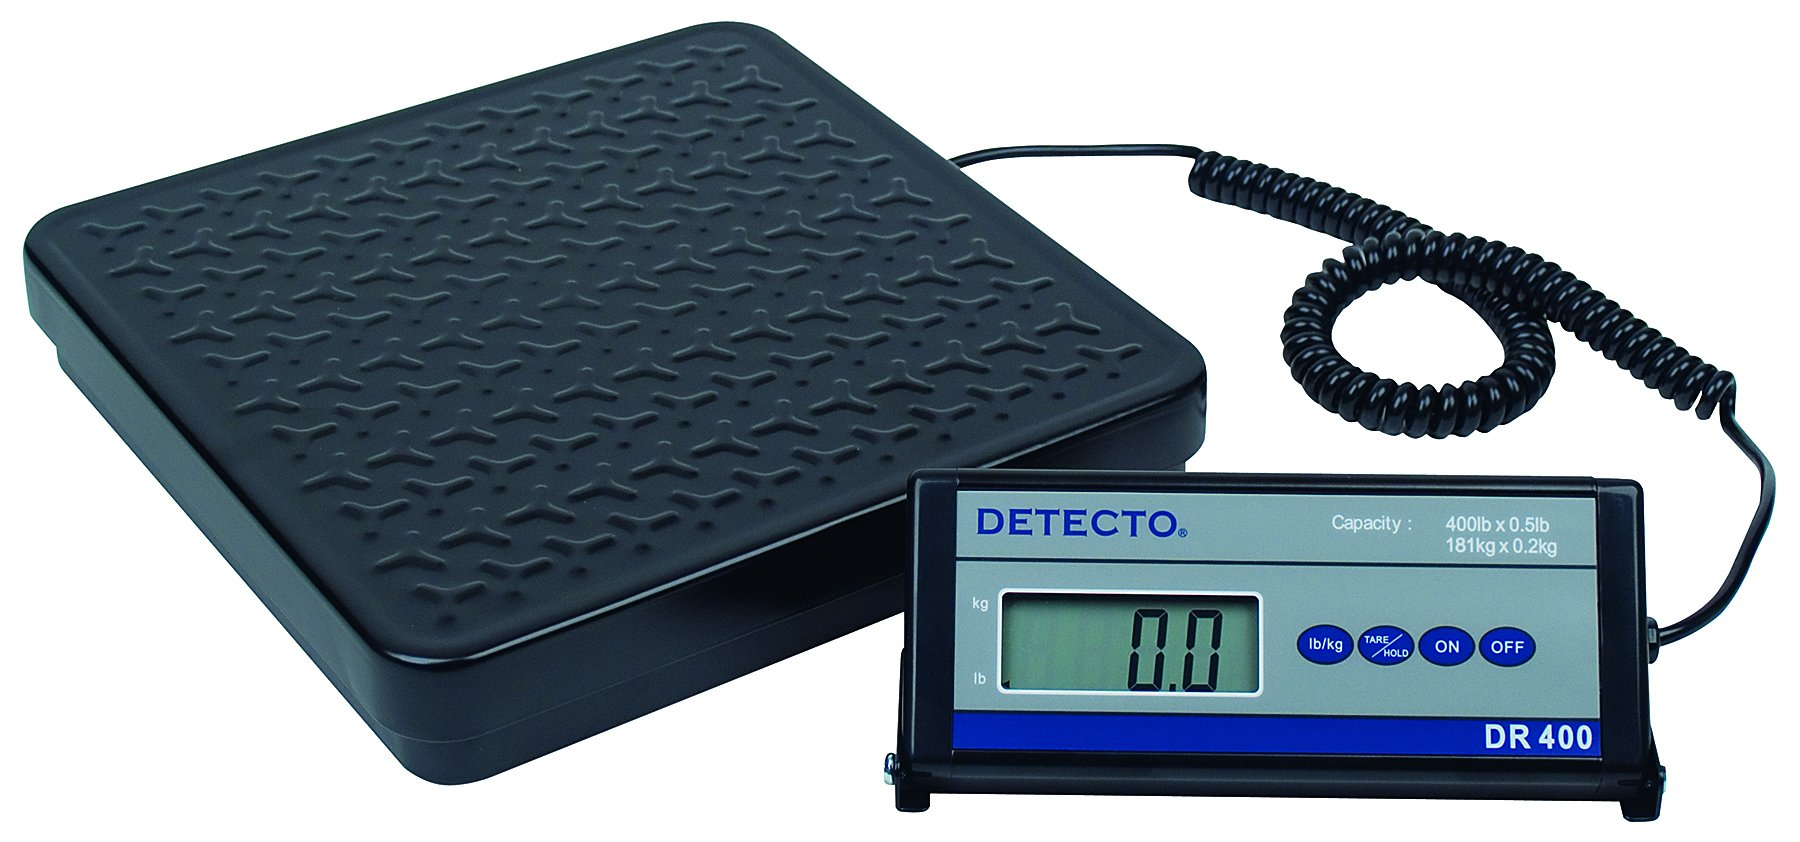 Detecto DR400 Portable Digital Receiving Scale,12'' x 12'', 400 lb. Capacity